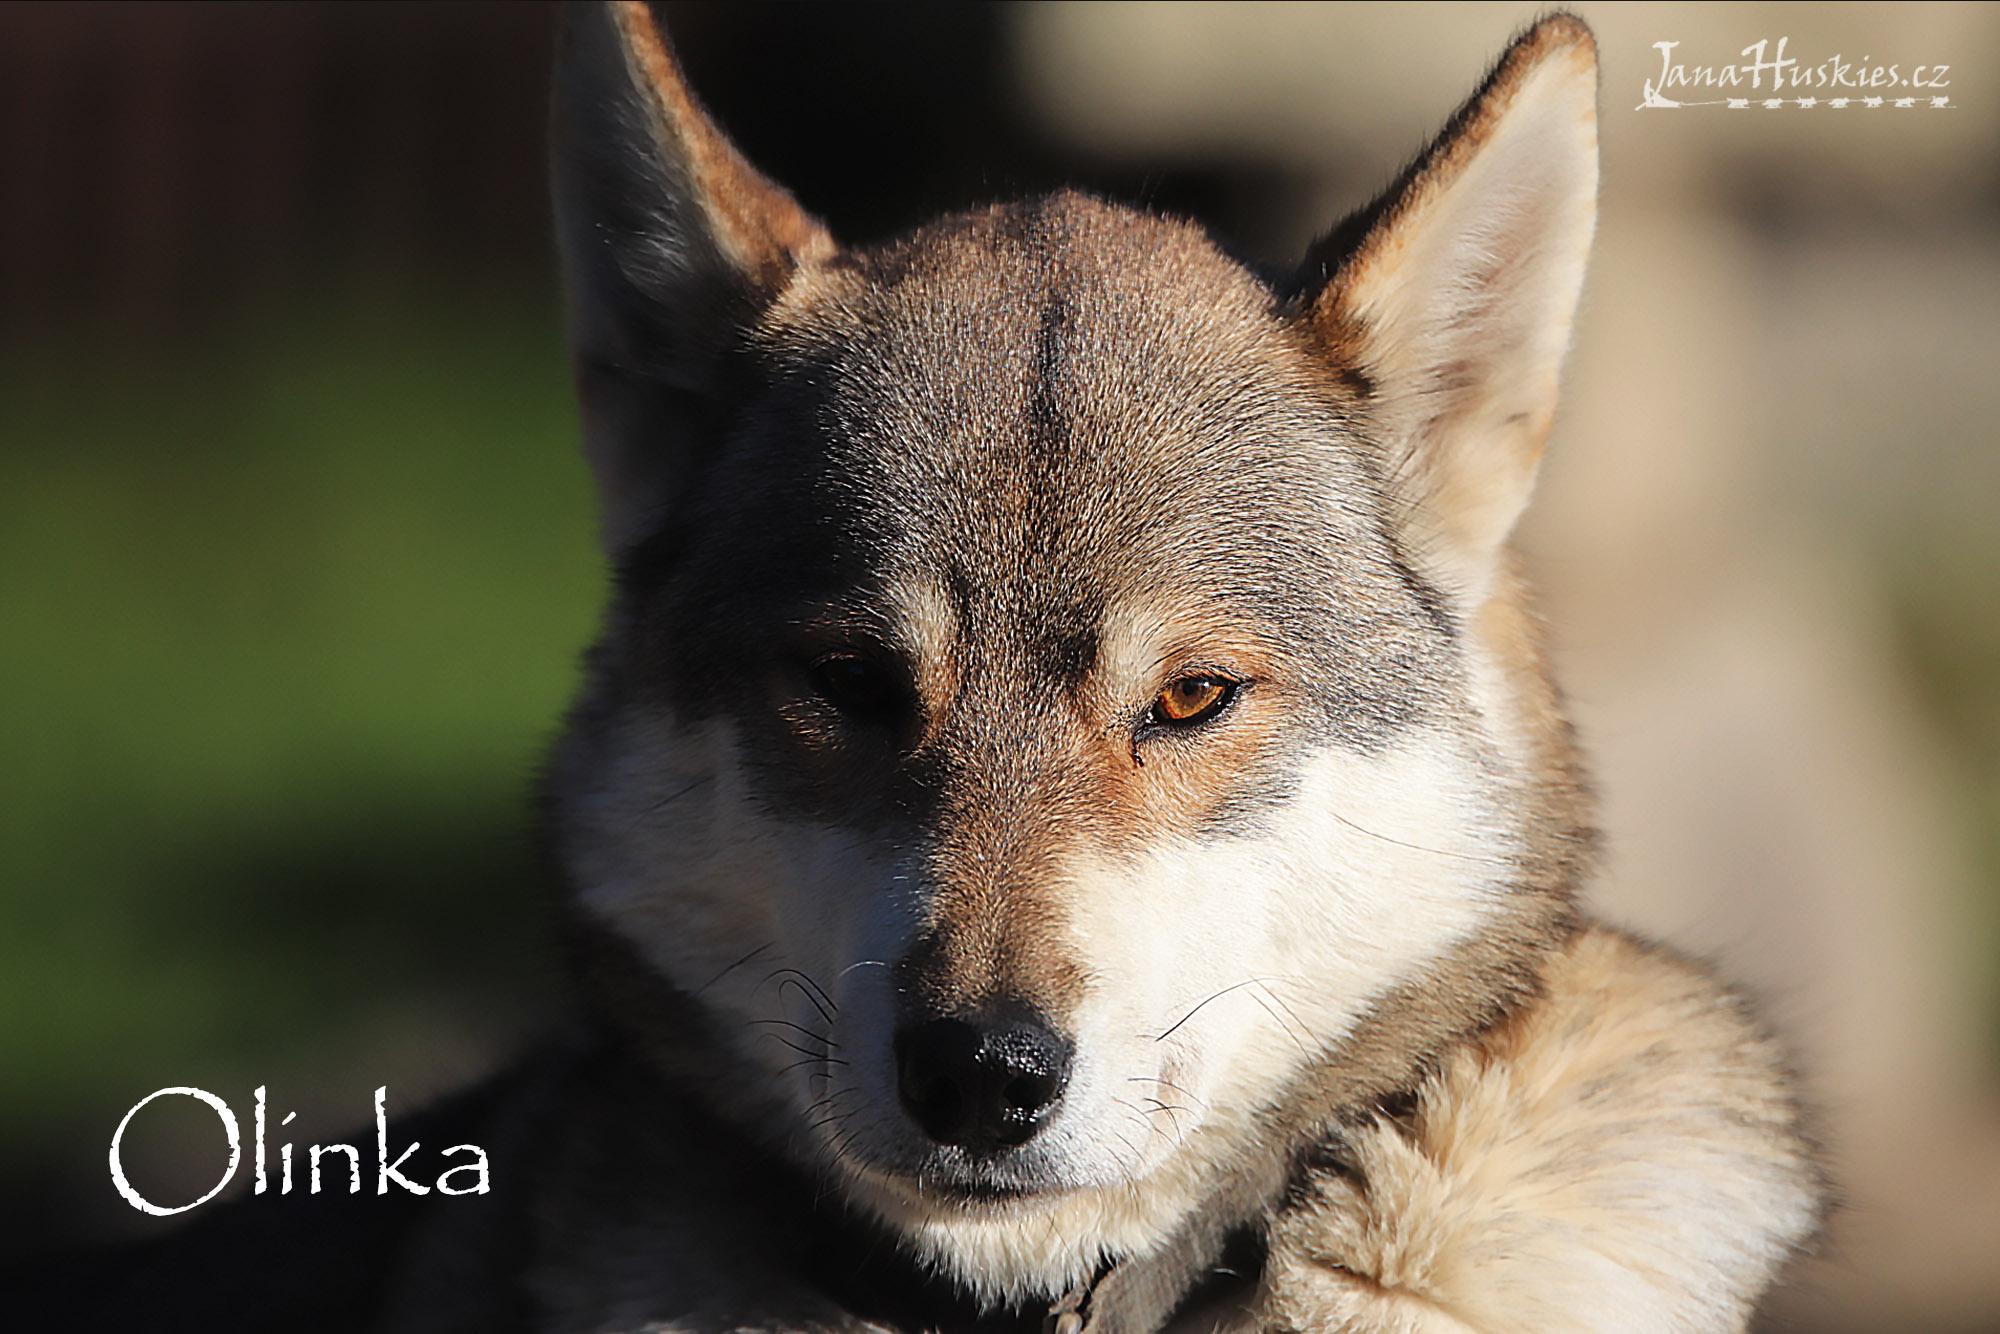 olinka1